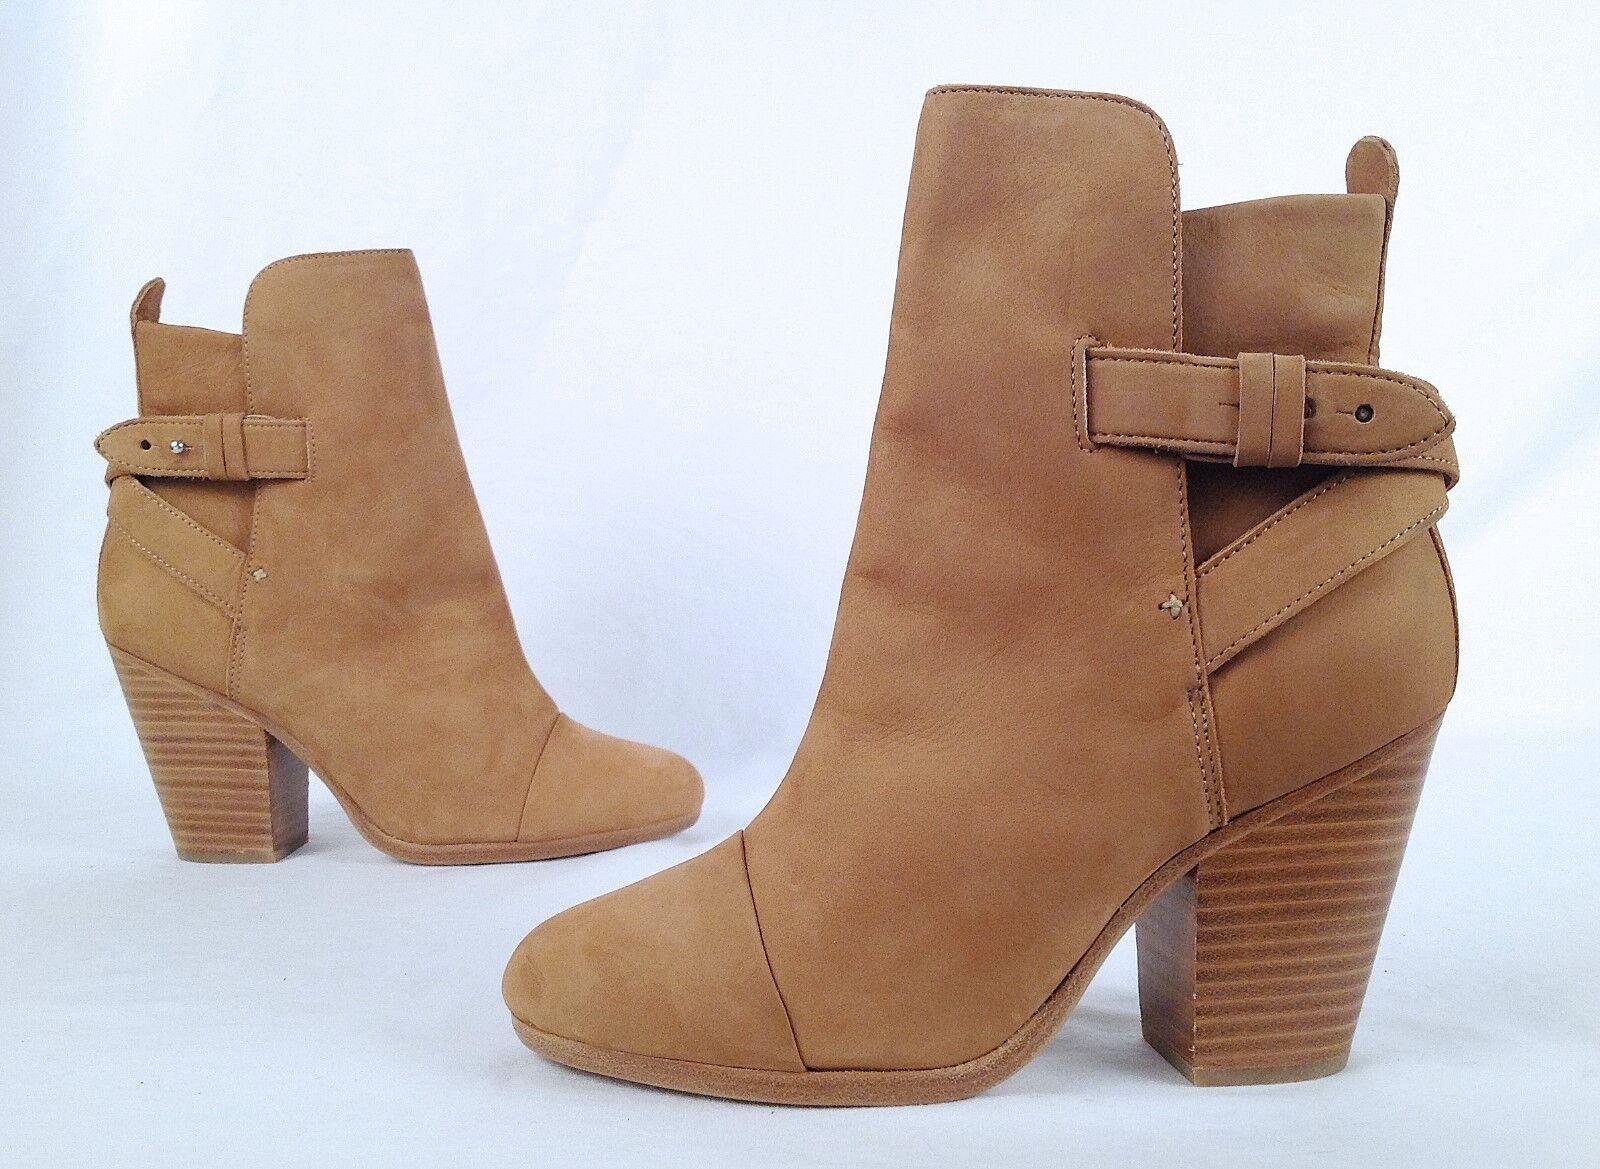 NEW   rag & bone 'Kinsey' Bootie- Camel- Size 5.5 US  36 EU  (P33)